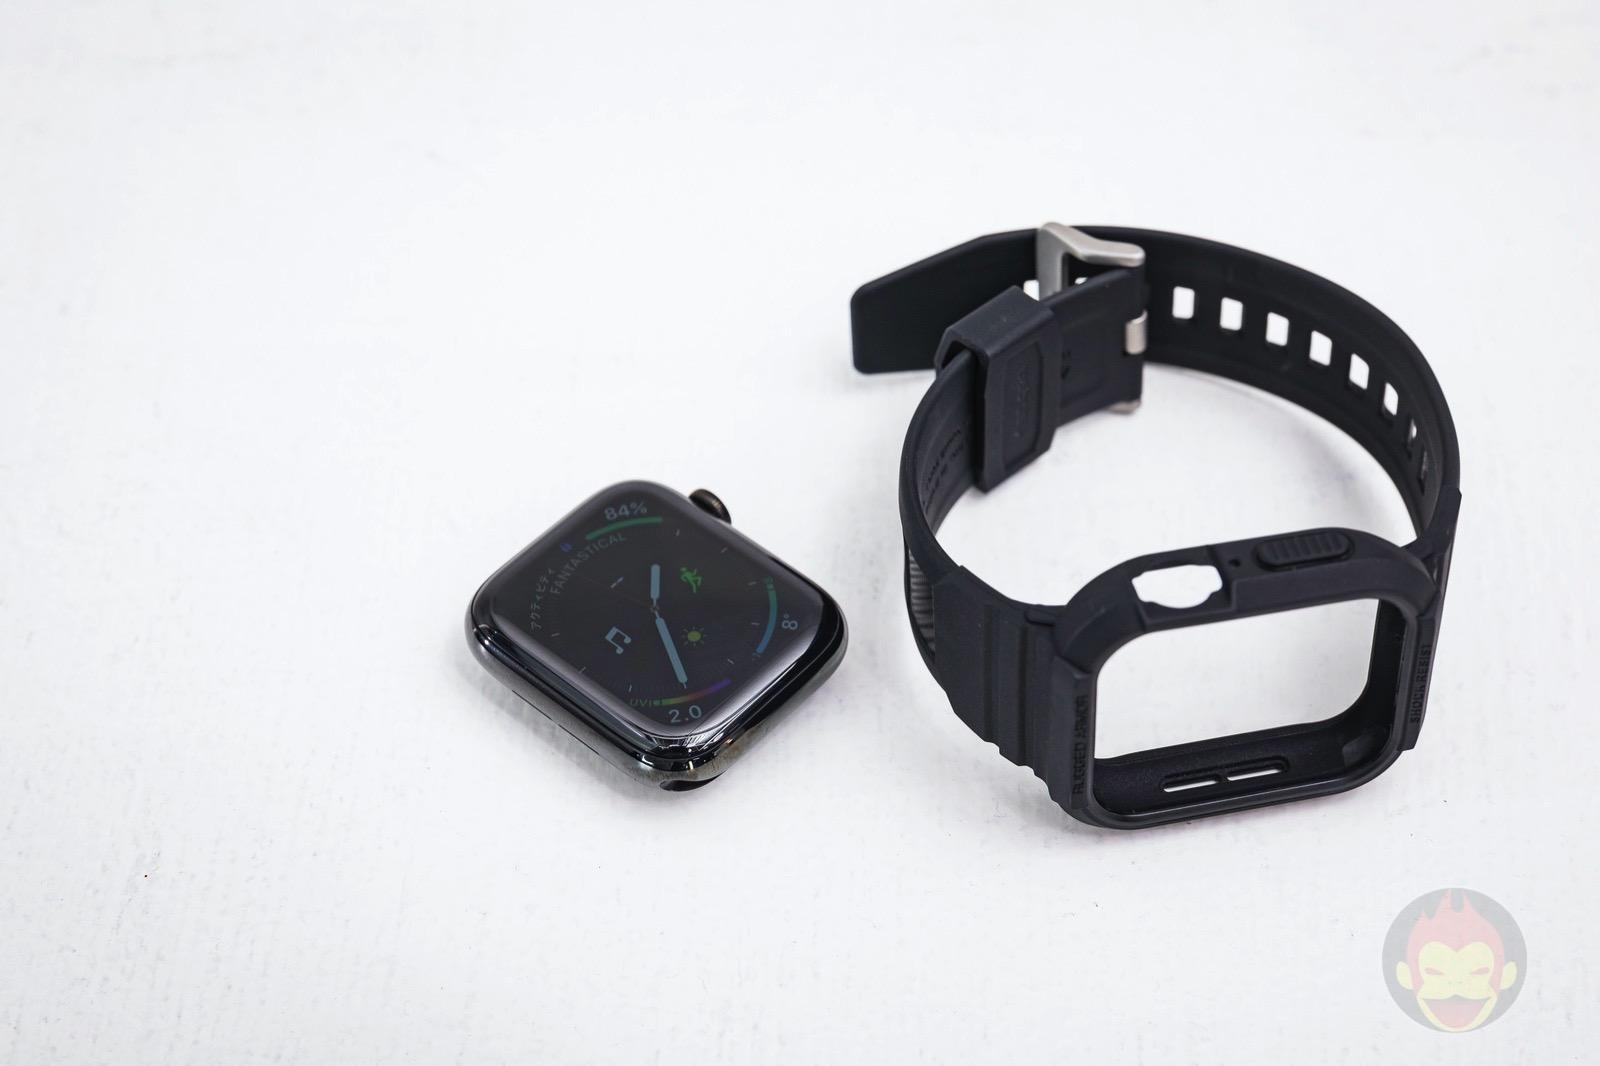 Spigen-Rugged-Armor-Pro-Apple-Watch-Band-and-case-07.jpg